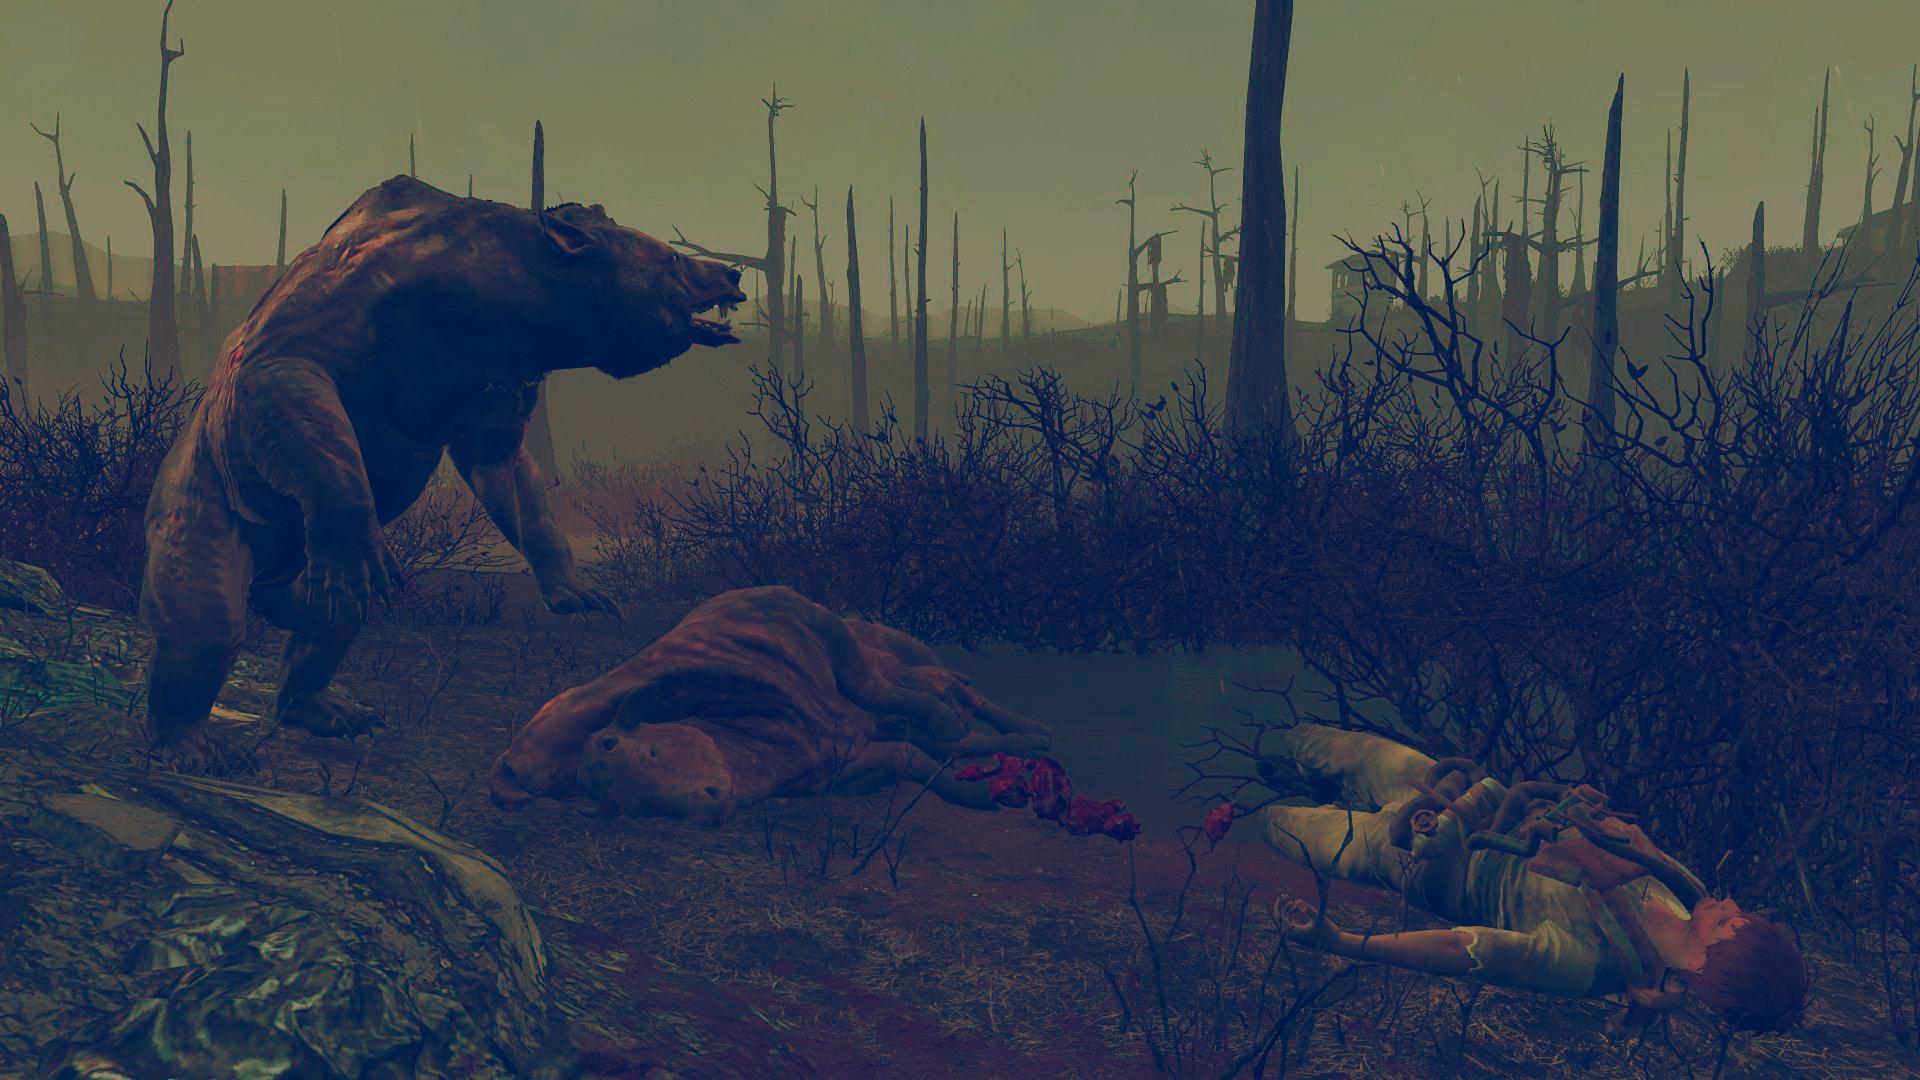 Медведь и добыча - Fallout 4 Яо-Гай